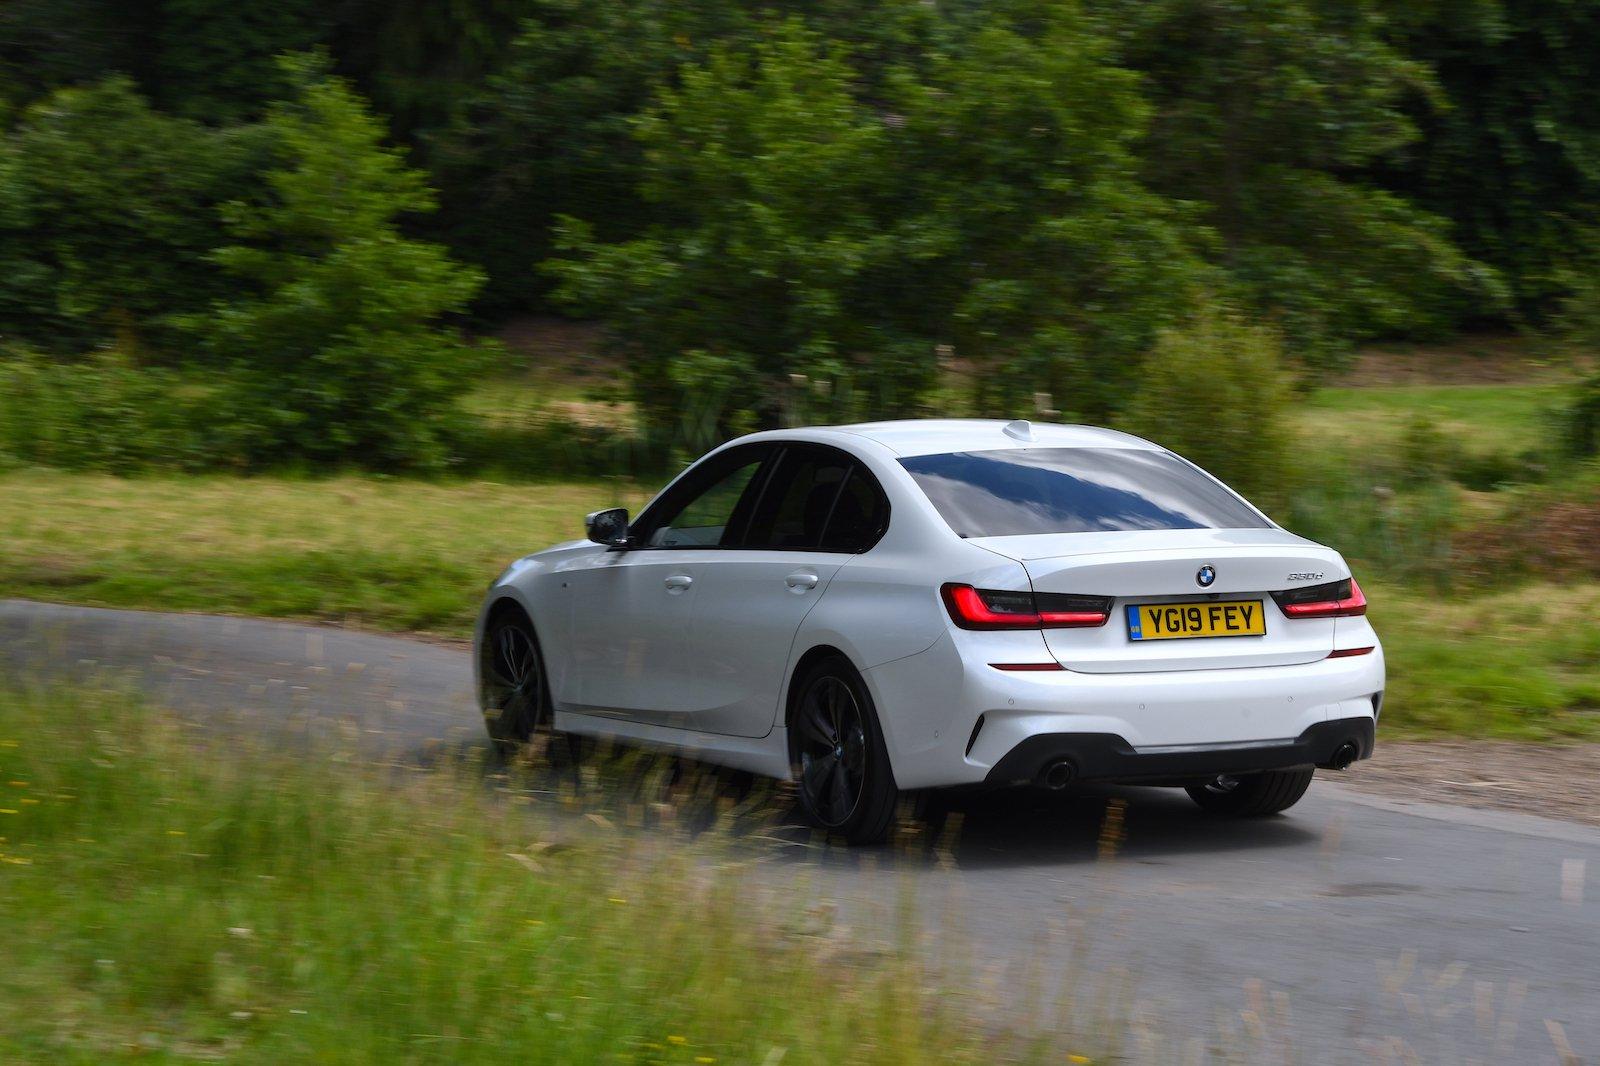 2019 BMW 330d rear